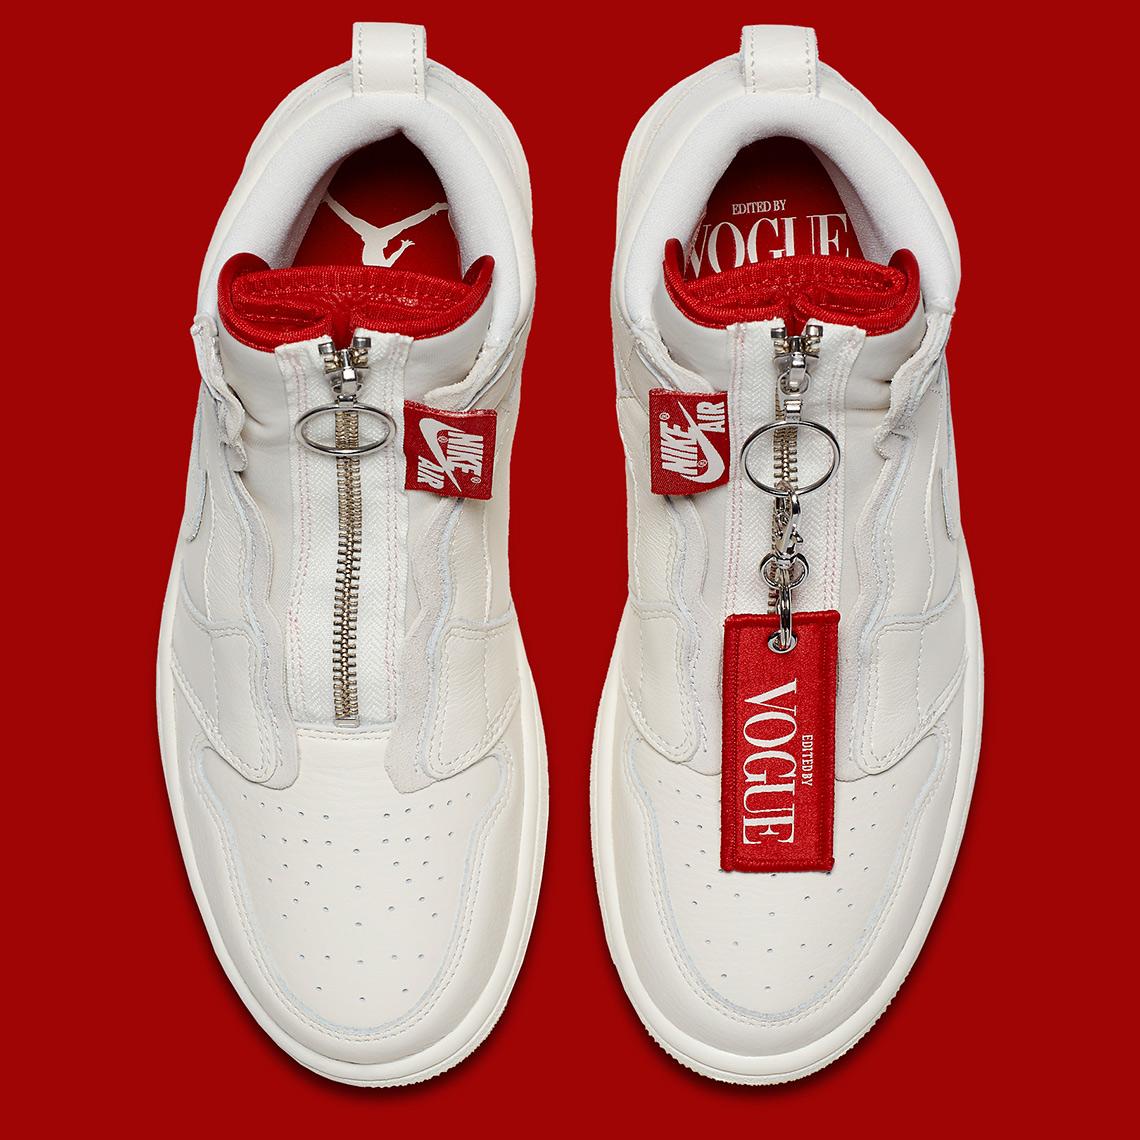 finest selection 0c516 881af Anna Wintour x Air Jordan 1 High Zip AWOK Release Date  July 23rd, 2018   220. Style Code  BQ0864-106. Advertisement. Advertisement